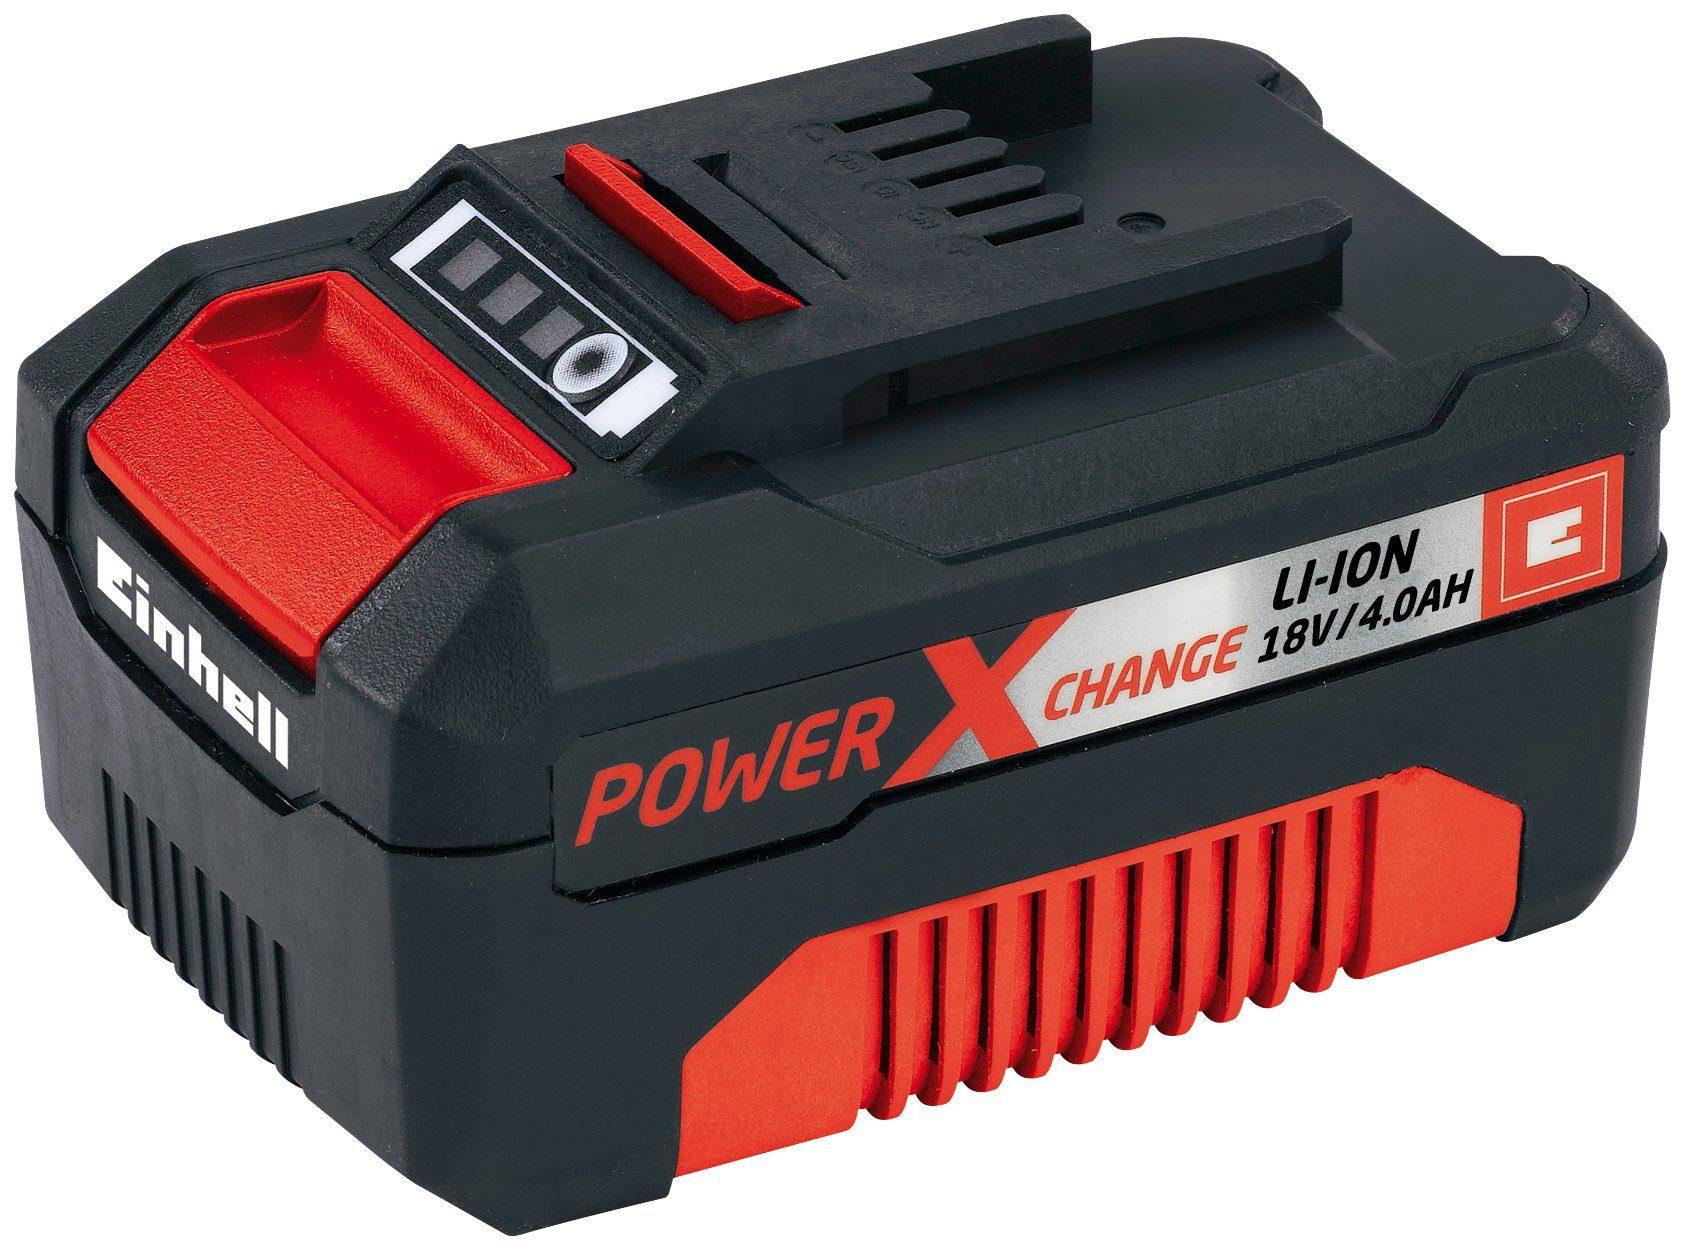 EINHELL Akku »Power-X-Change«, 18 V, 4,0 Ah